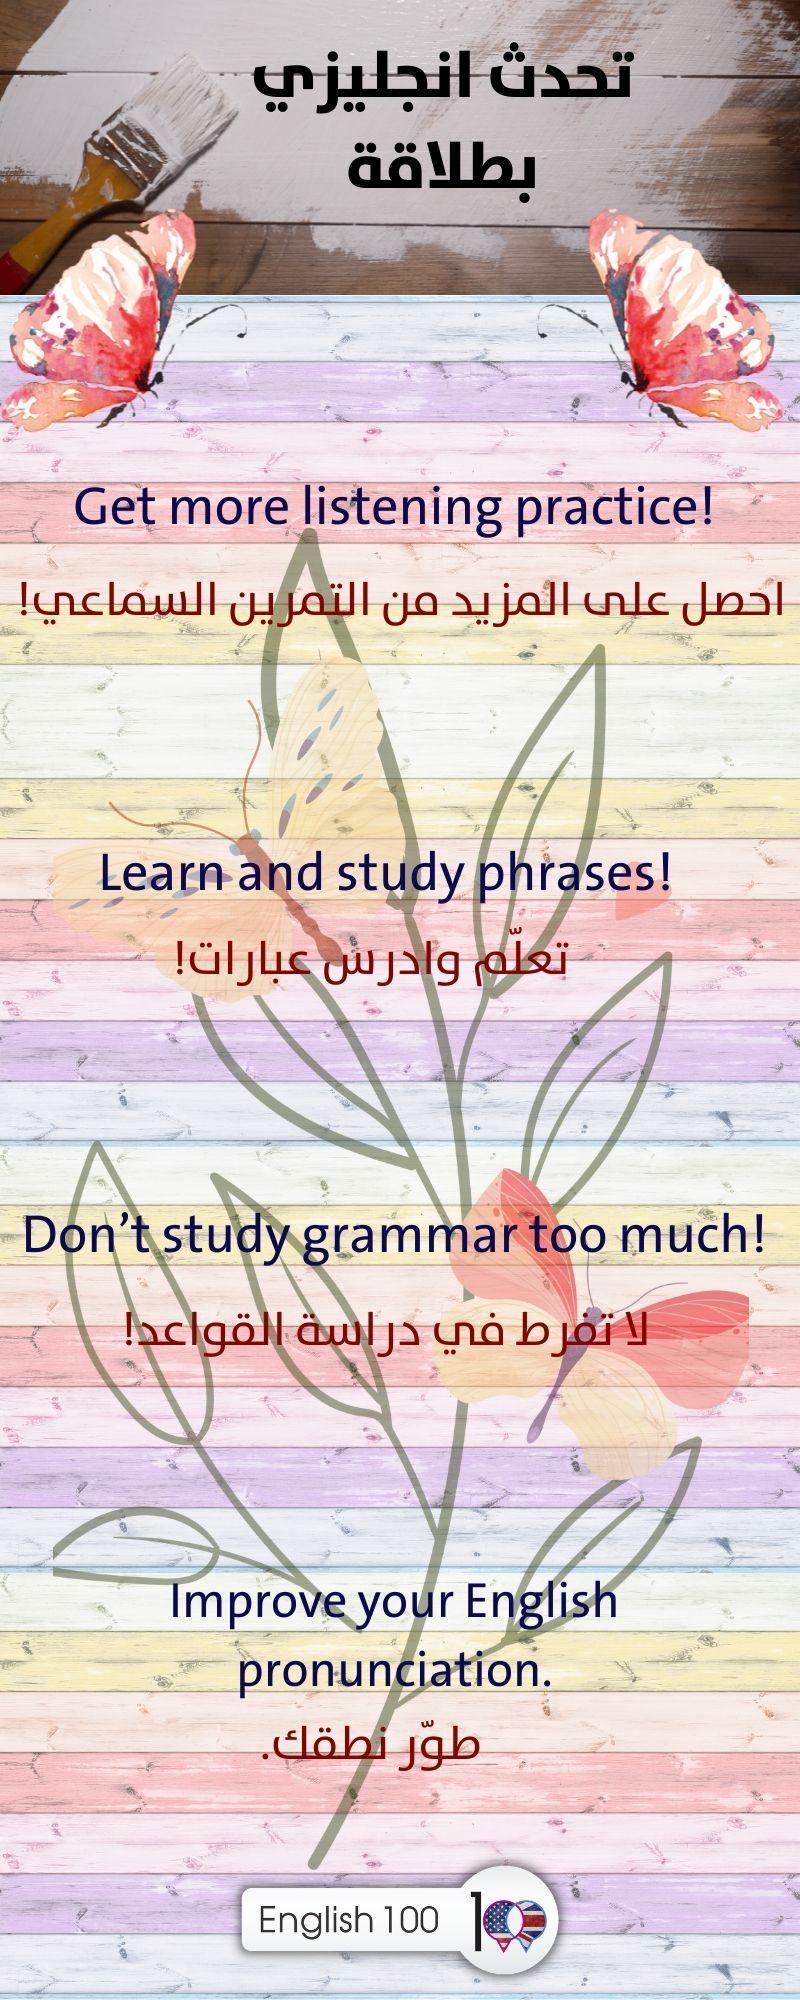 تحدث انجليزي بطلاقة Speak English fluently